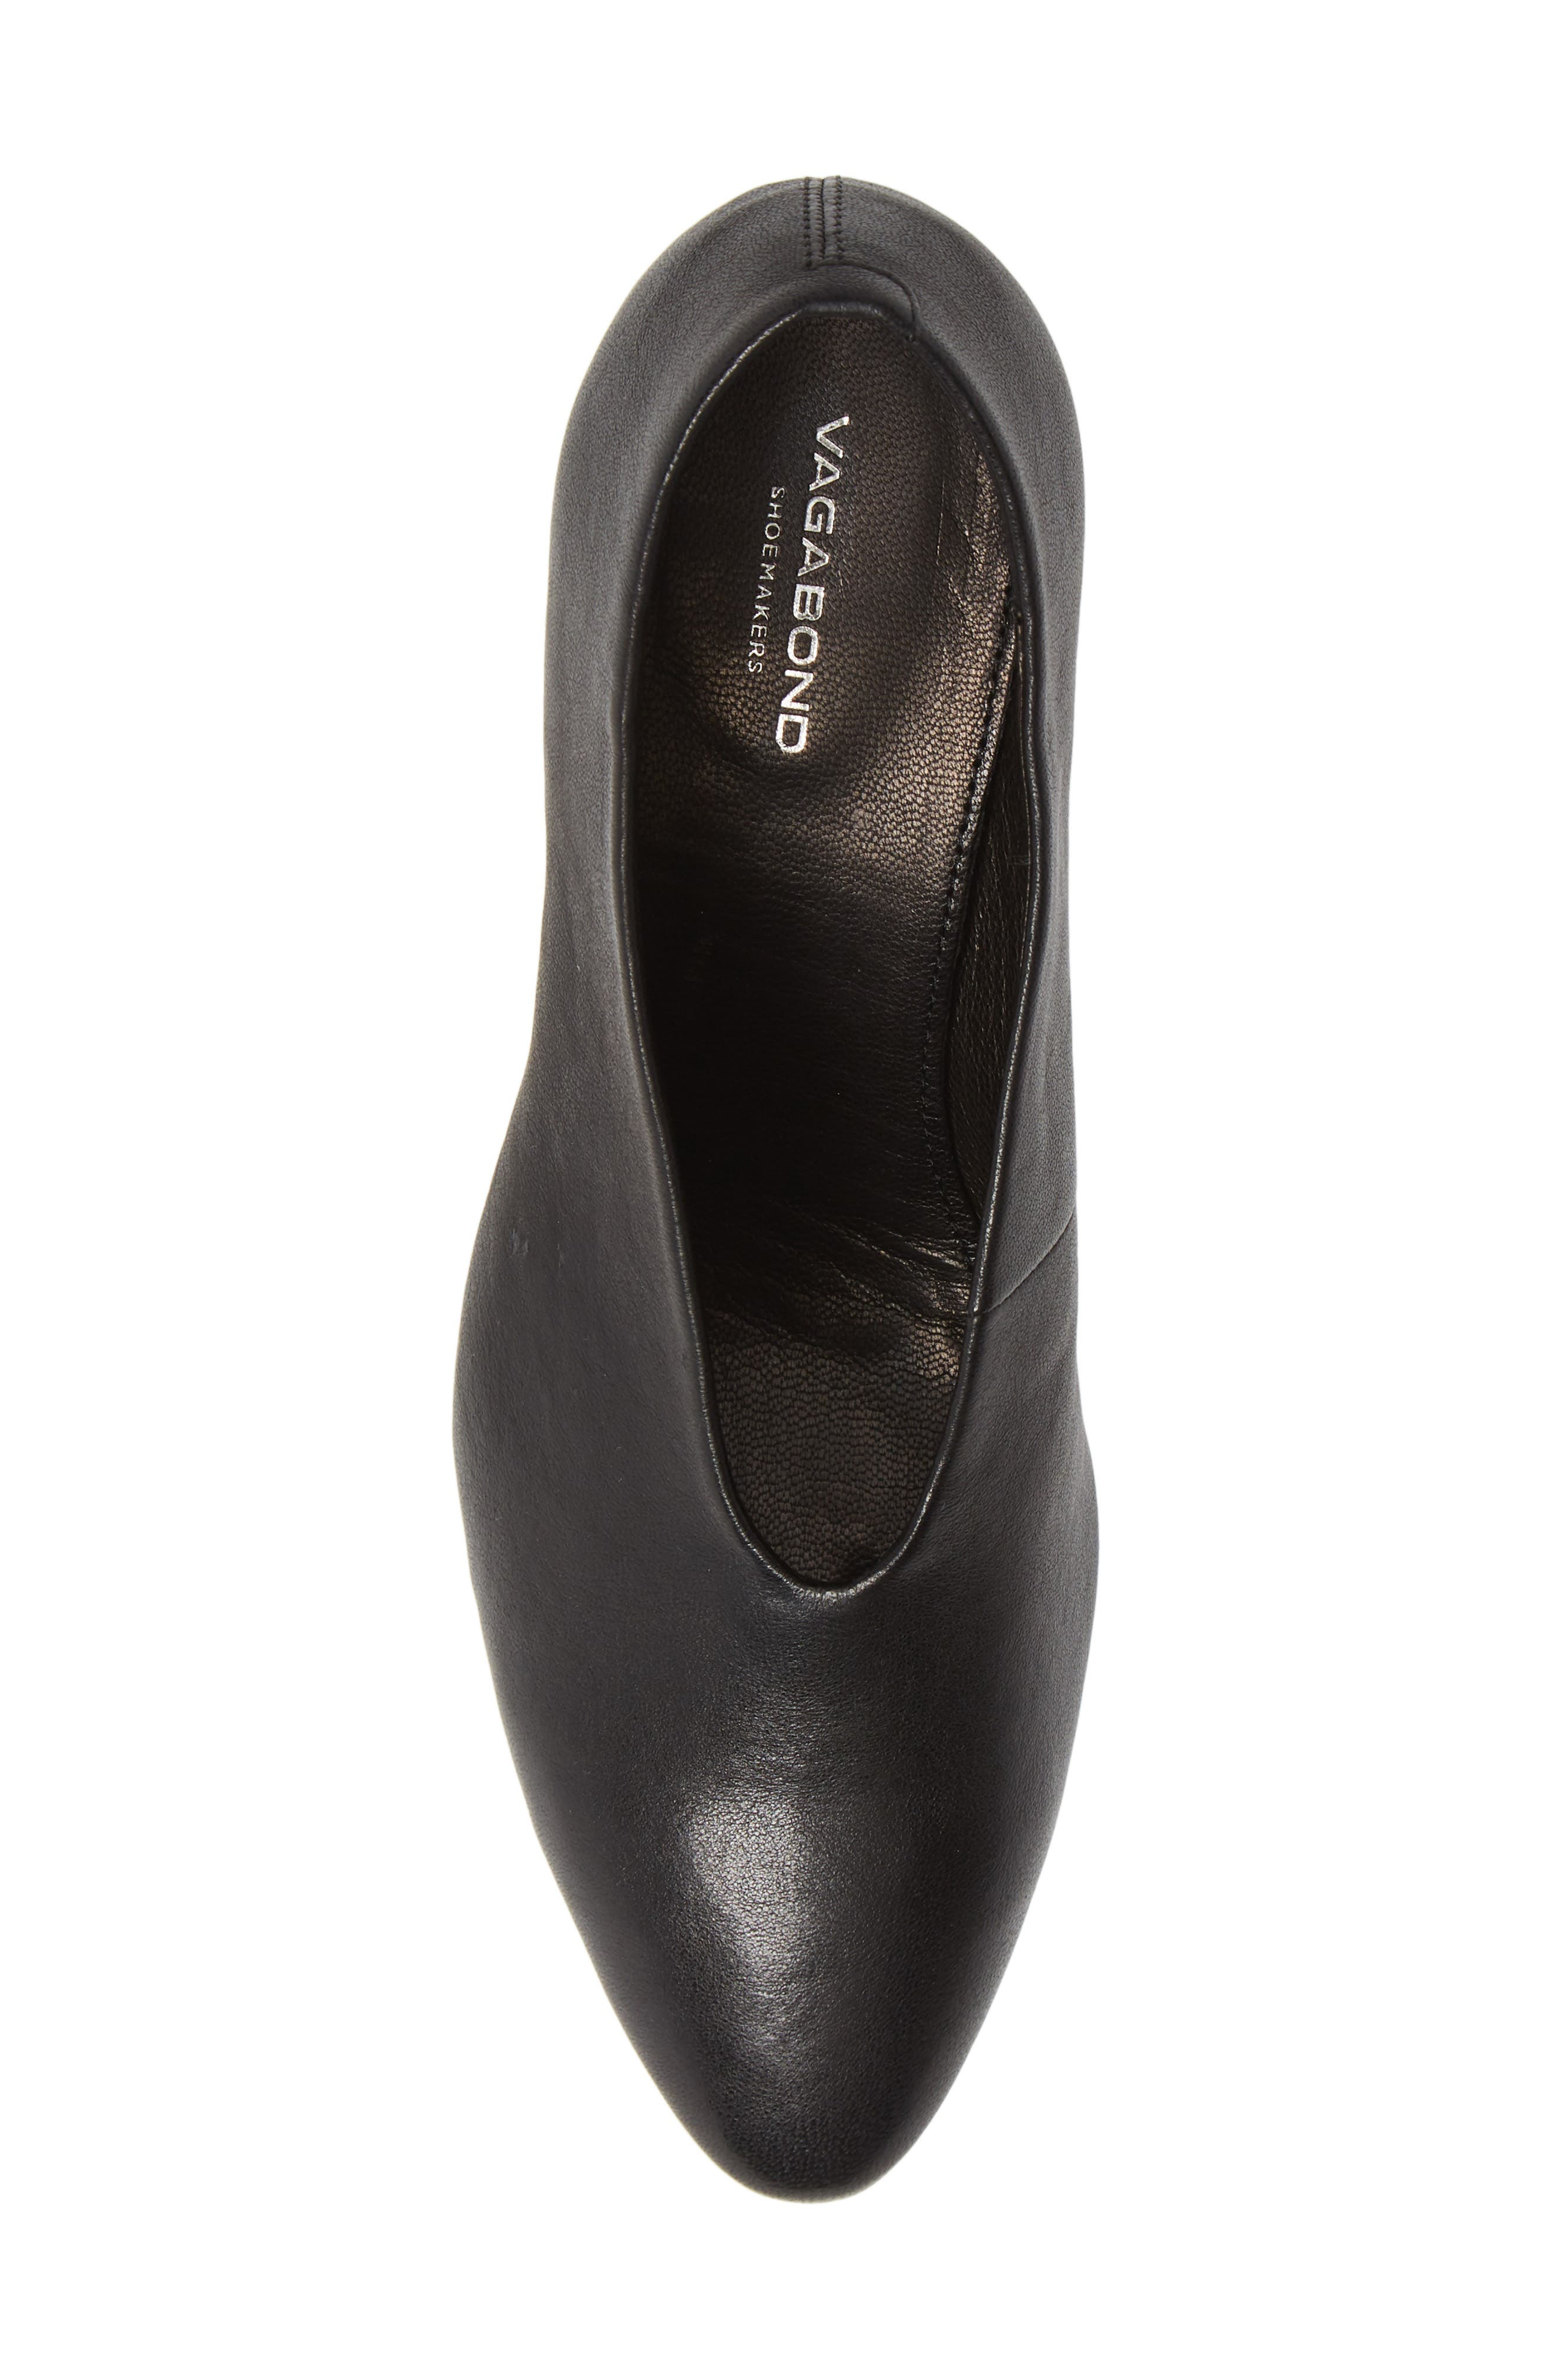 VAGABOND, Shoemakers Eve Pump, Alternate thumbnail 5, color, BLACK/ BLACK LEATHER